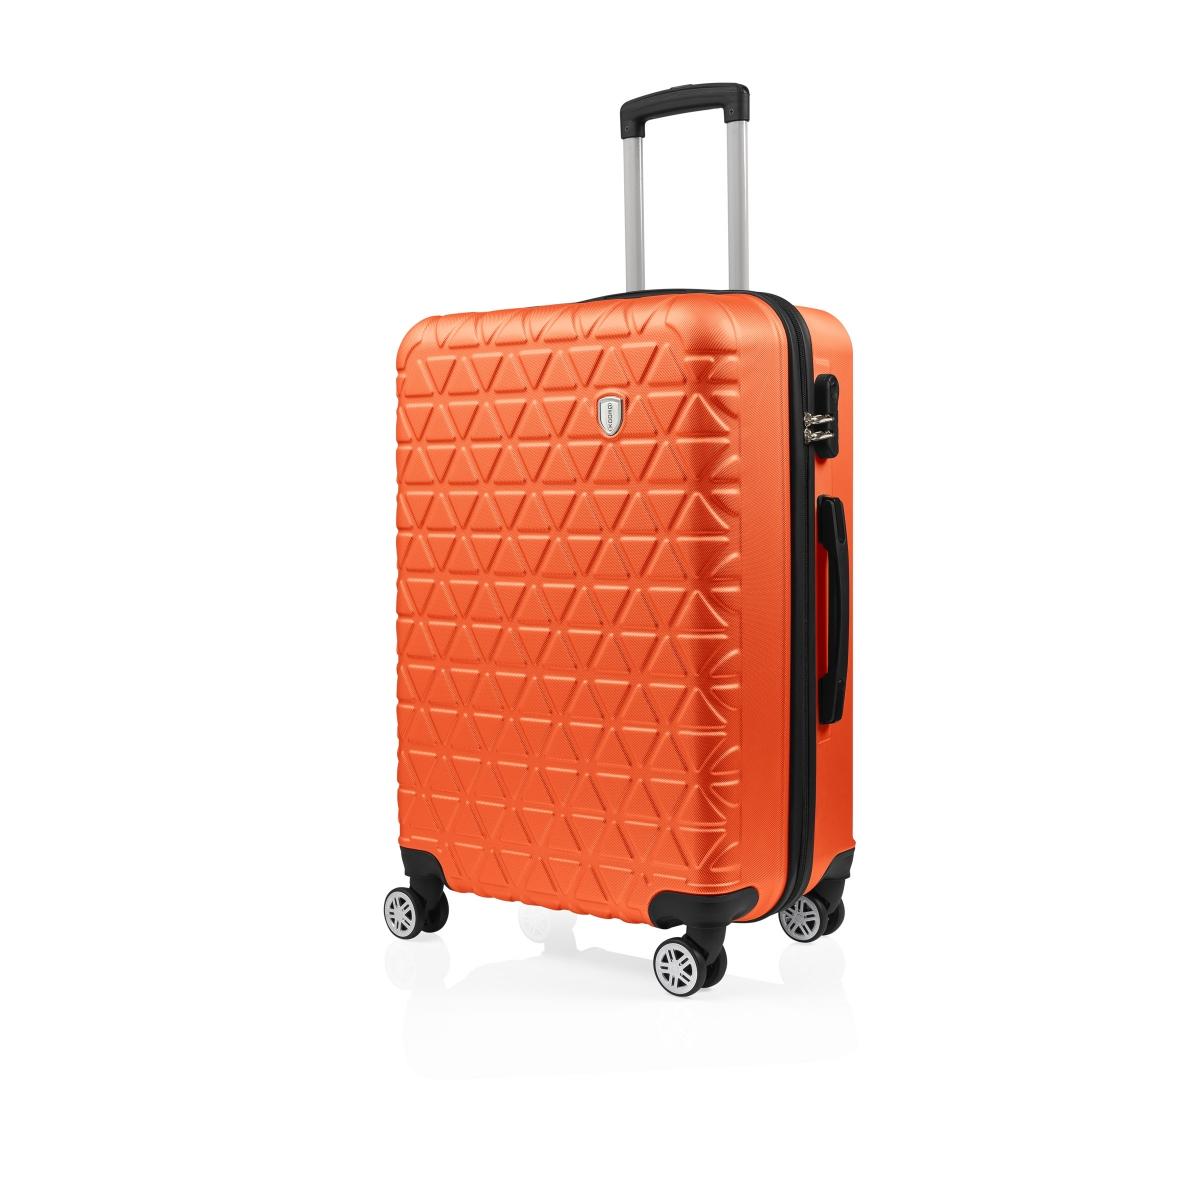 Gedox Abs 3'lü Valiz Seyahat Seti - Model:800.15 Turuncu